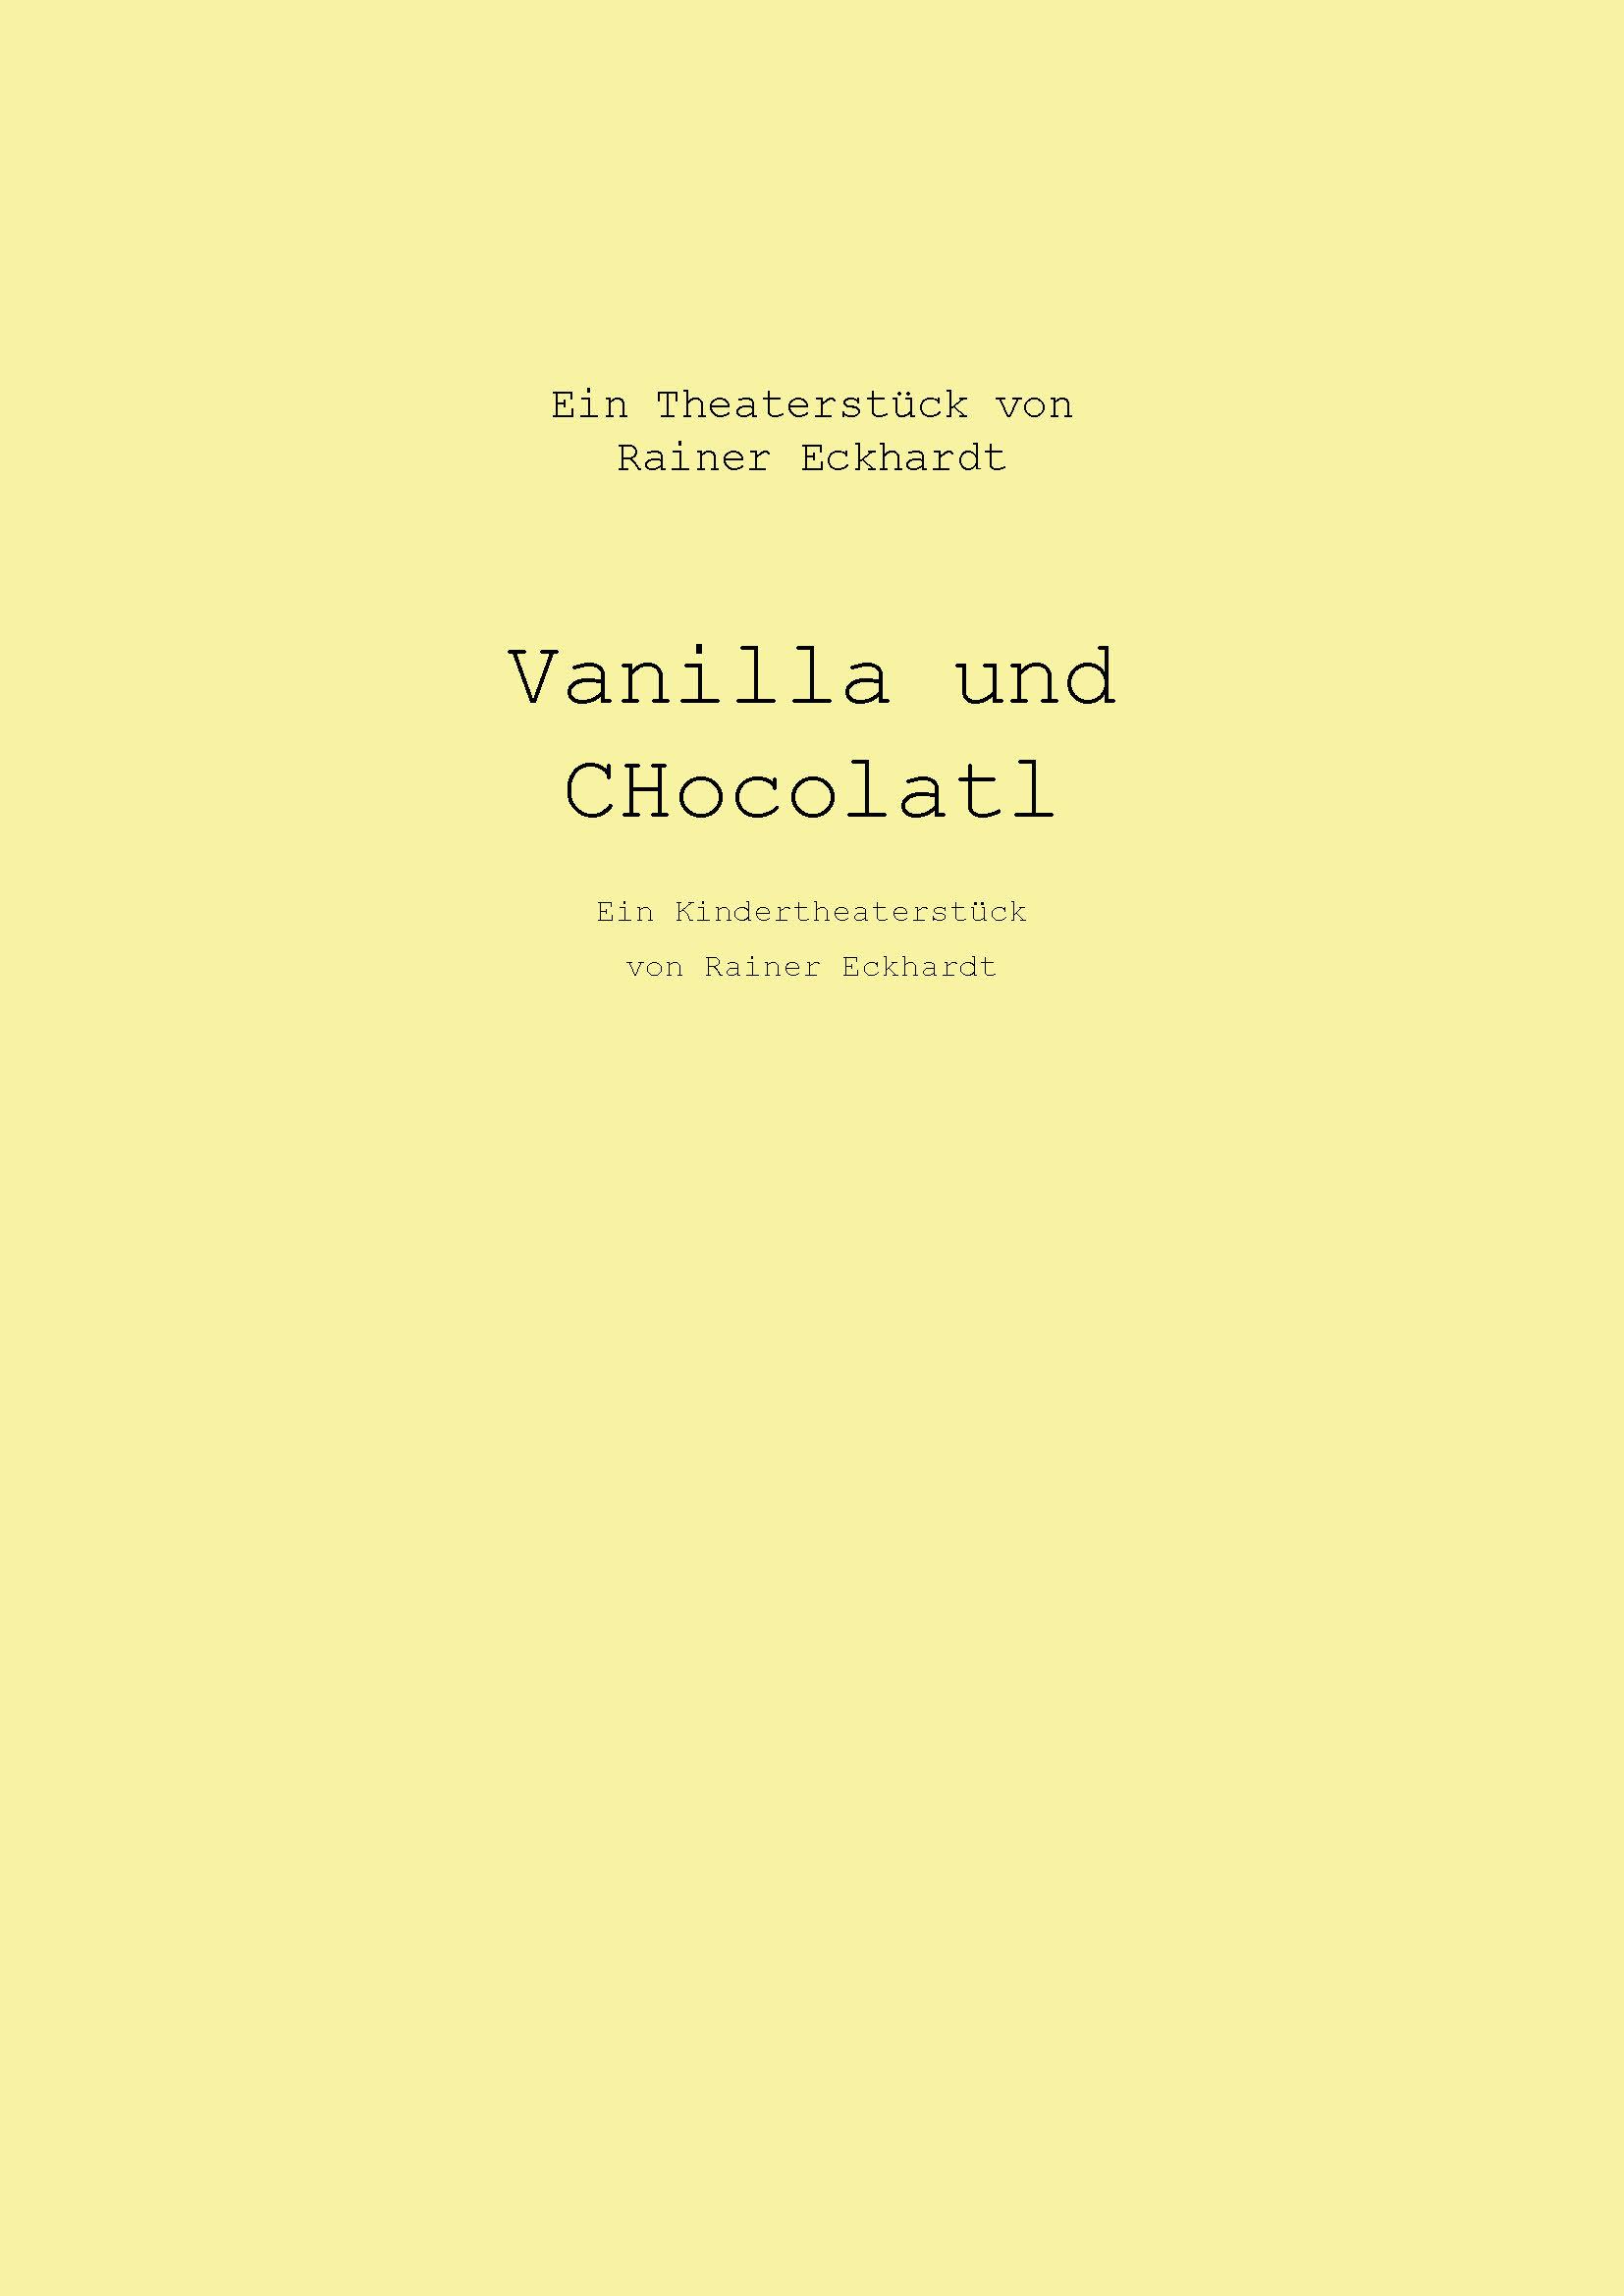 Vanilla Und Chocolatl